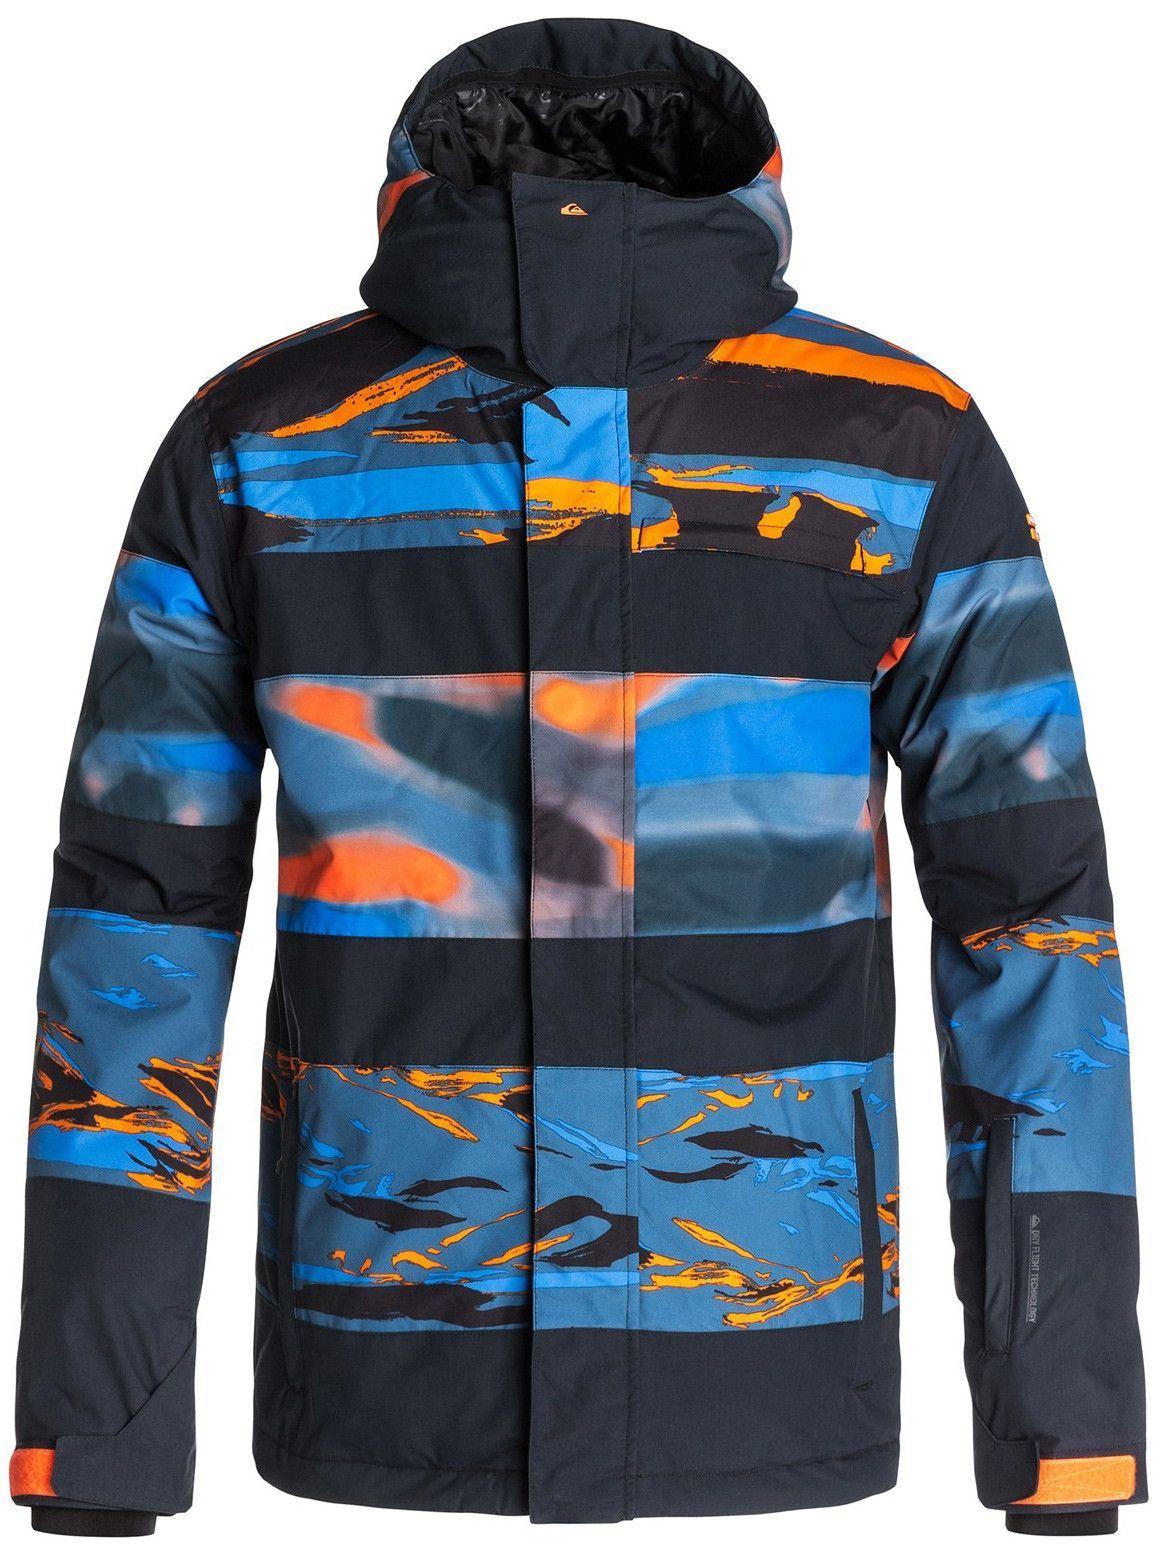 5473bf3f9de8 Quiksilver Fiction Snowboard Jacket Mens